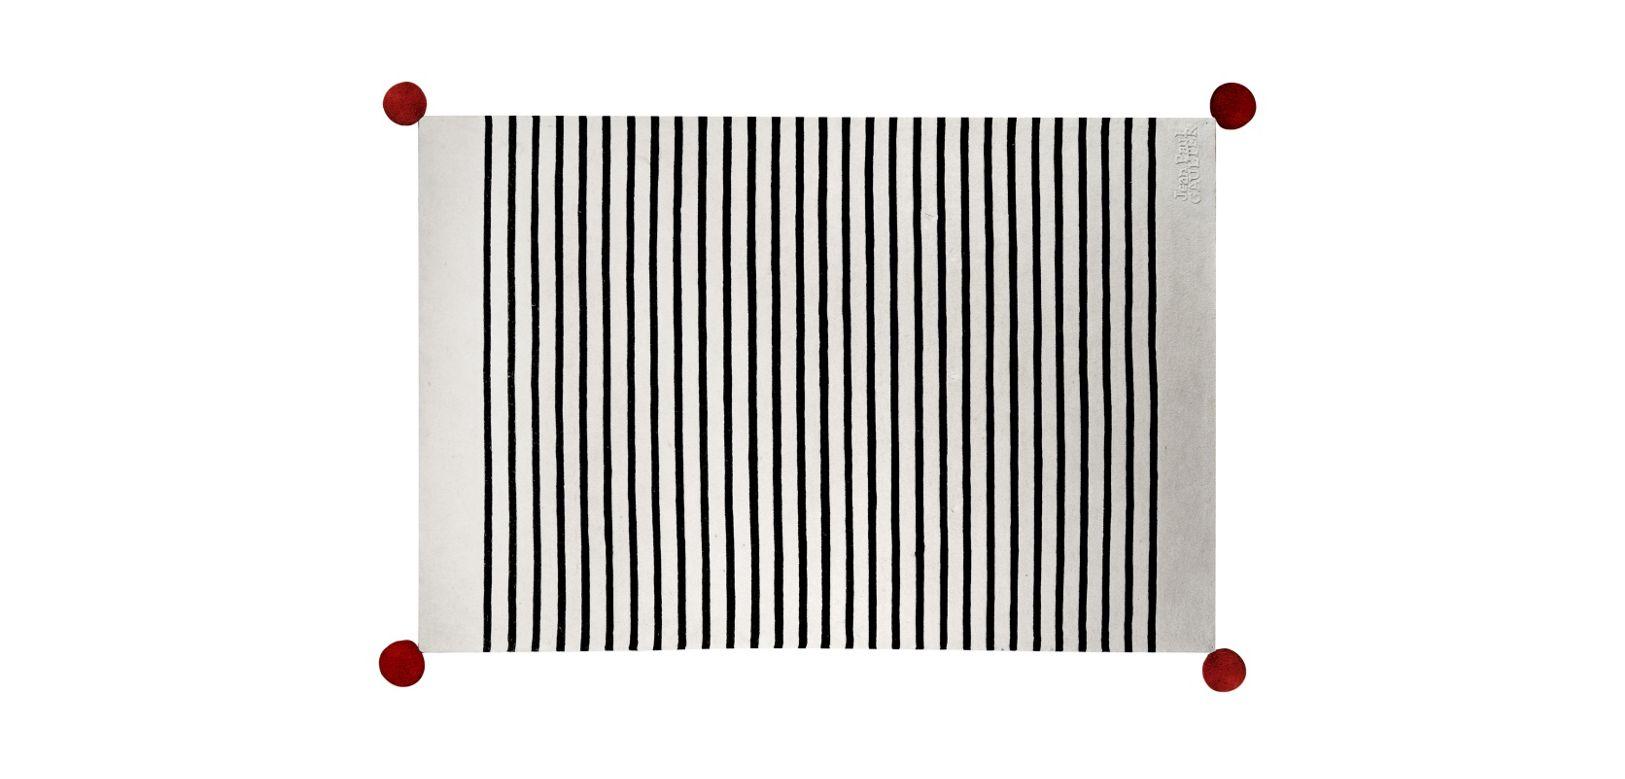 Tapis dunkerque jean paul gaultier roche bobois - Tapis contemporain roche bobois ...